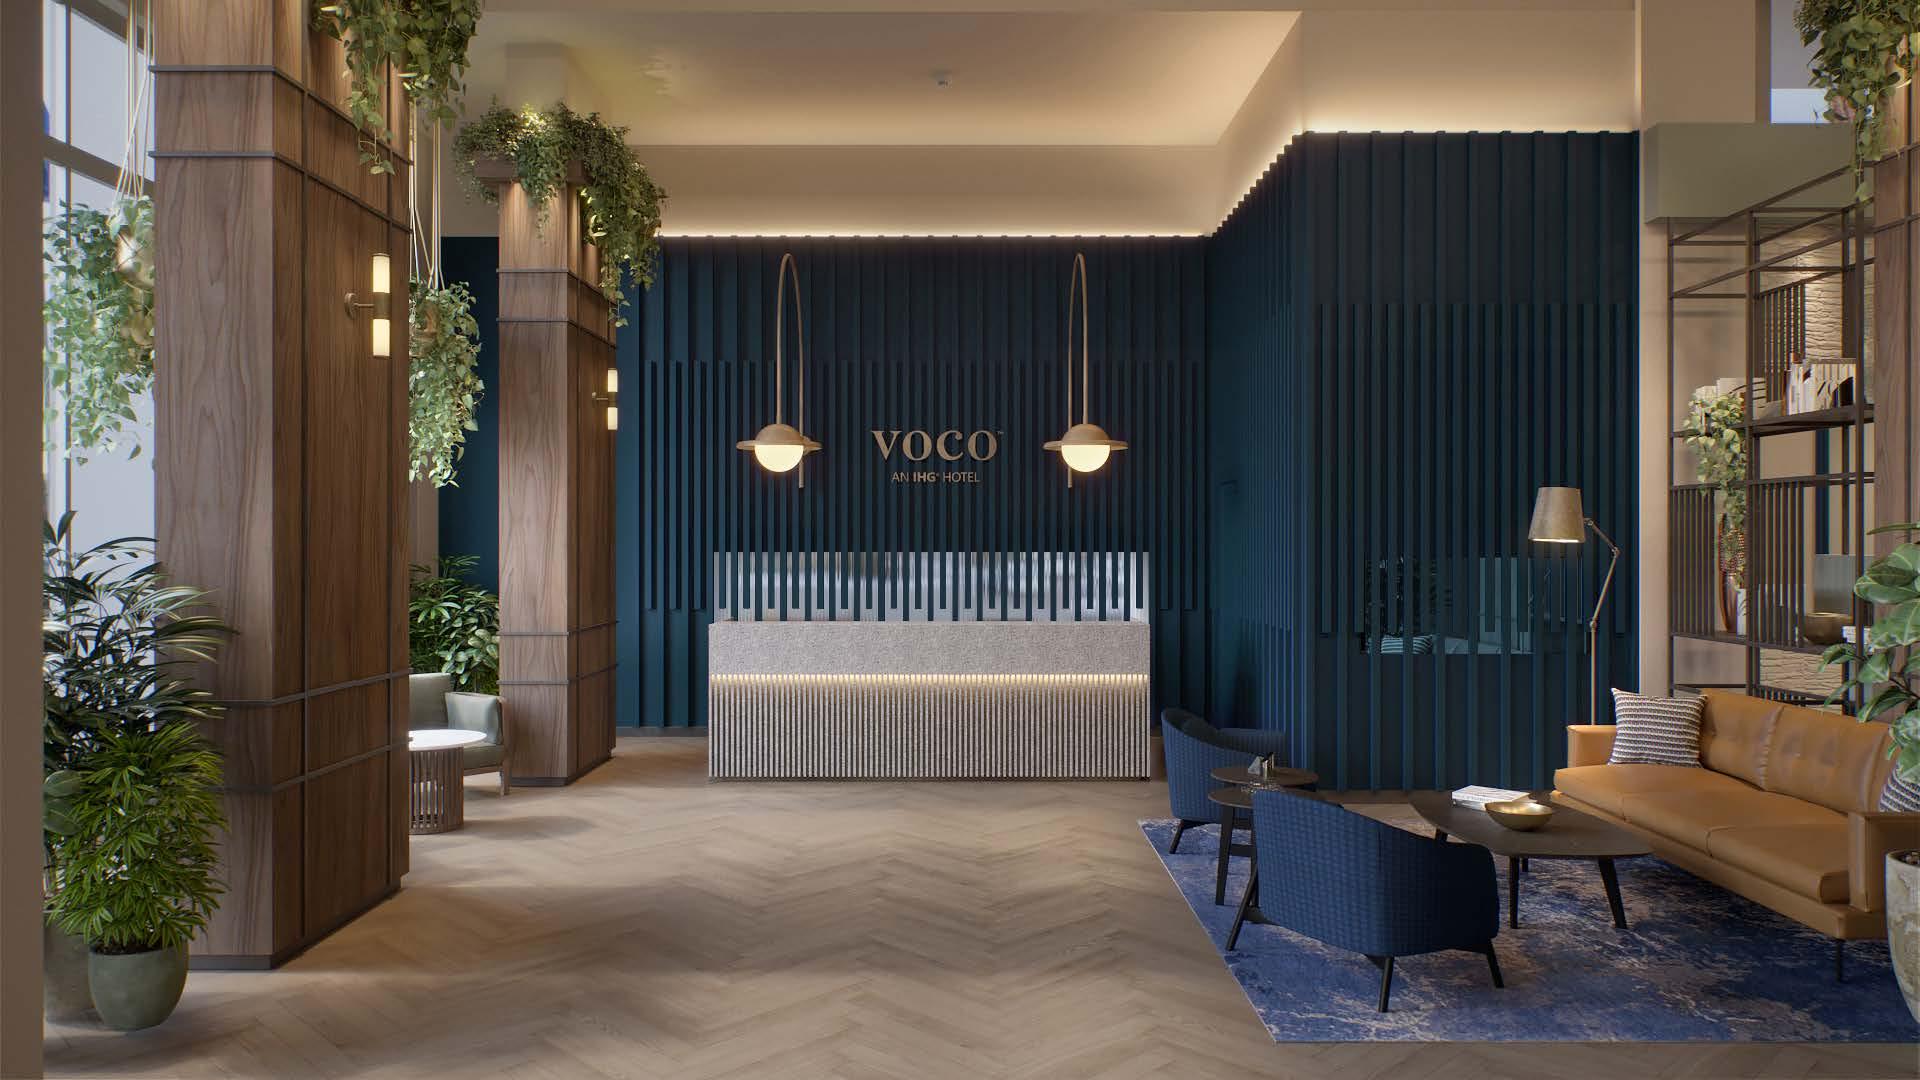 Best Western Plus Quid Hotel Venice Airport In Mestre